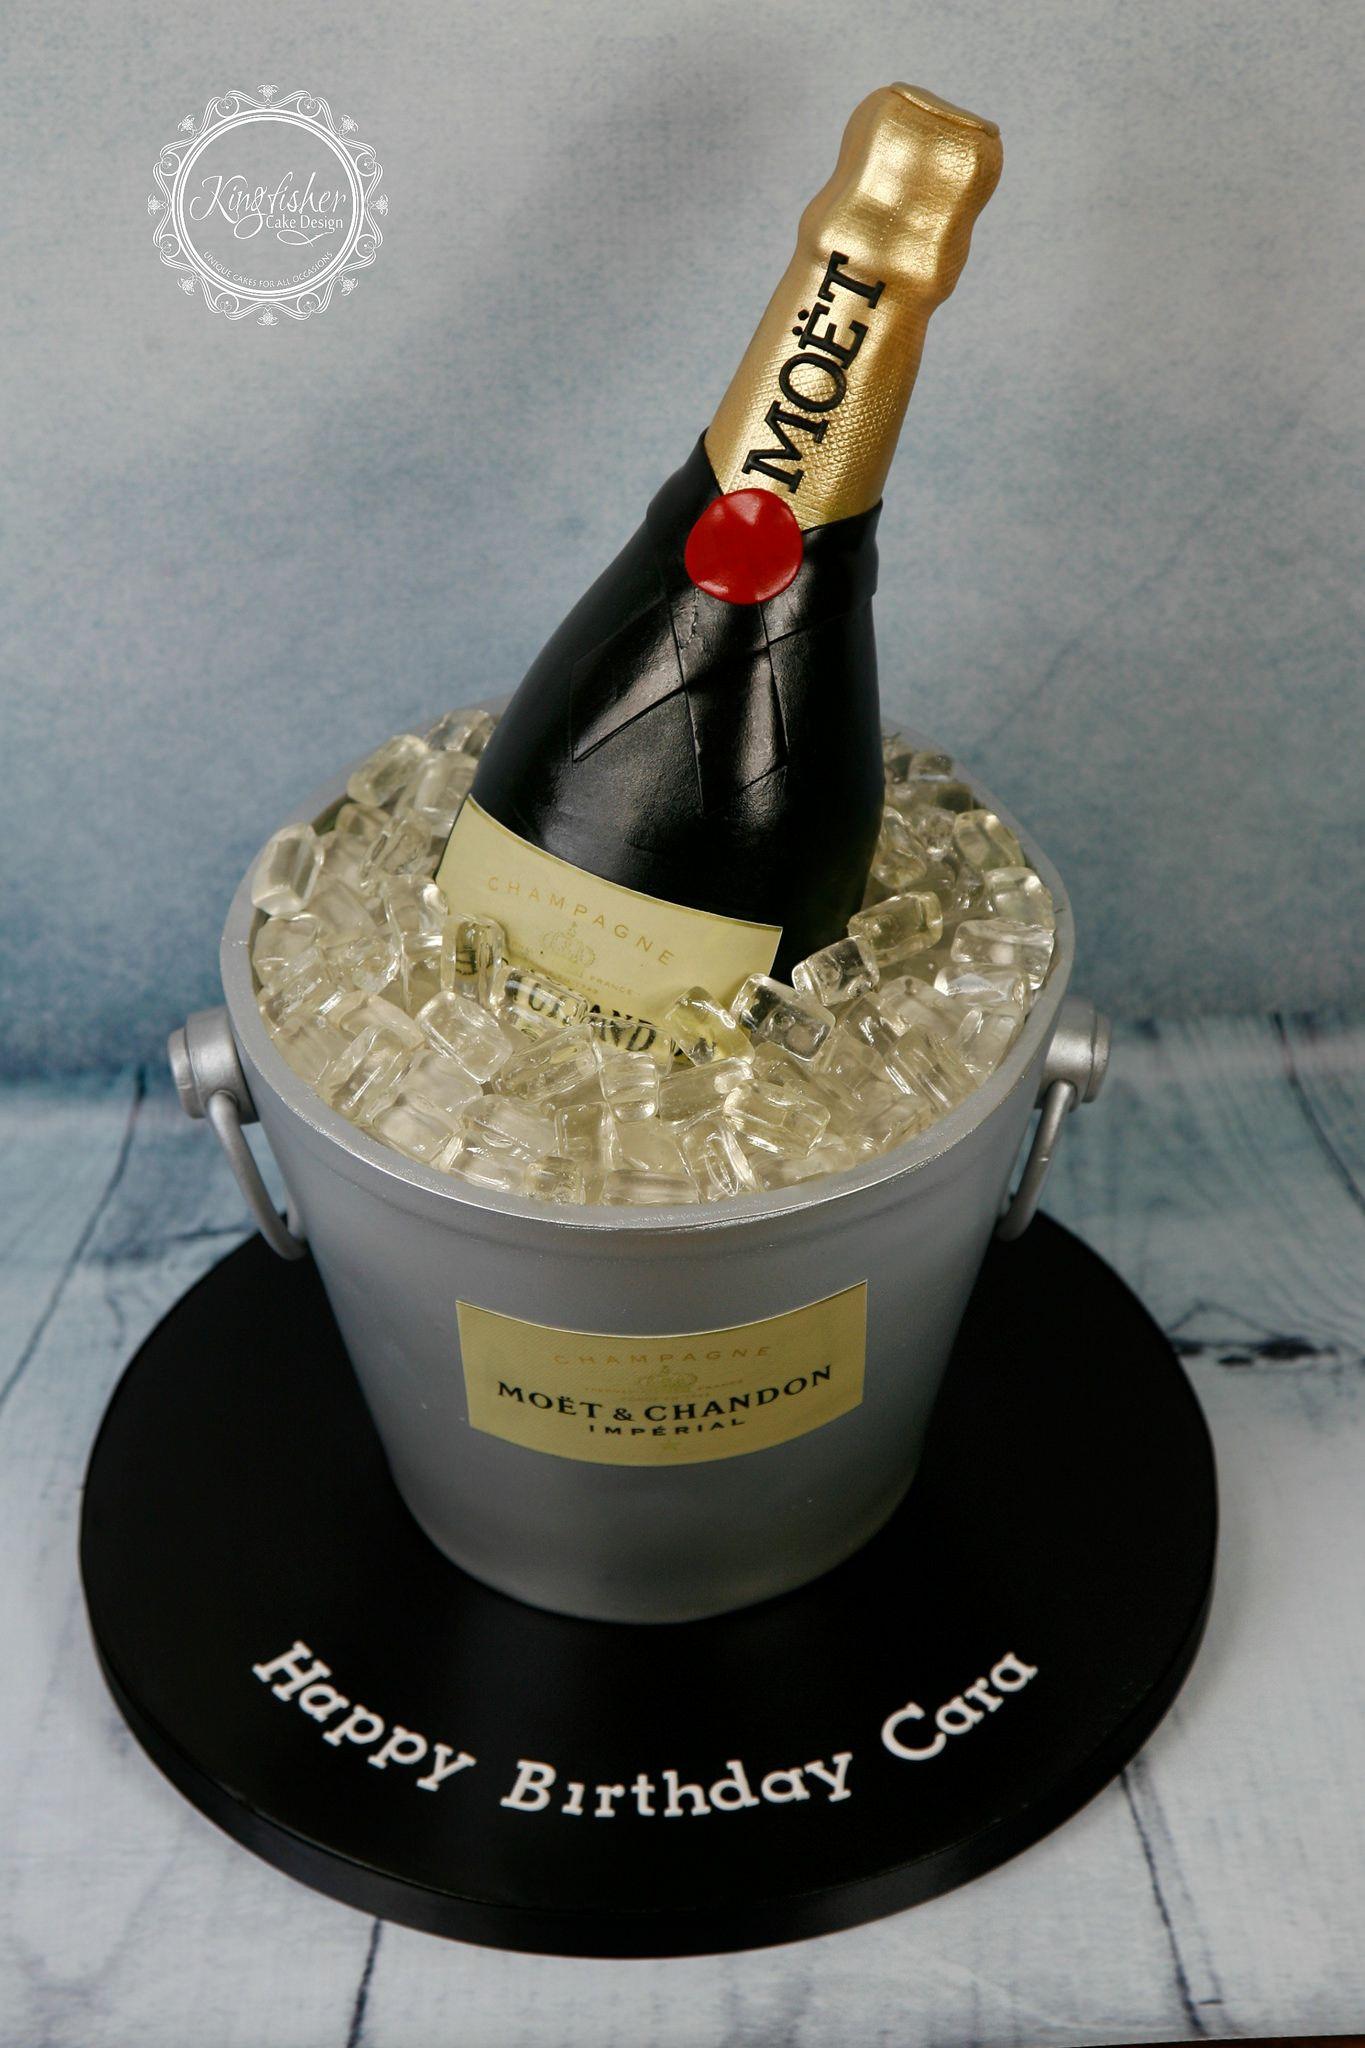 Champagne bottle cake